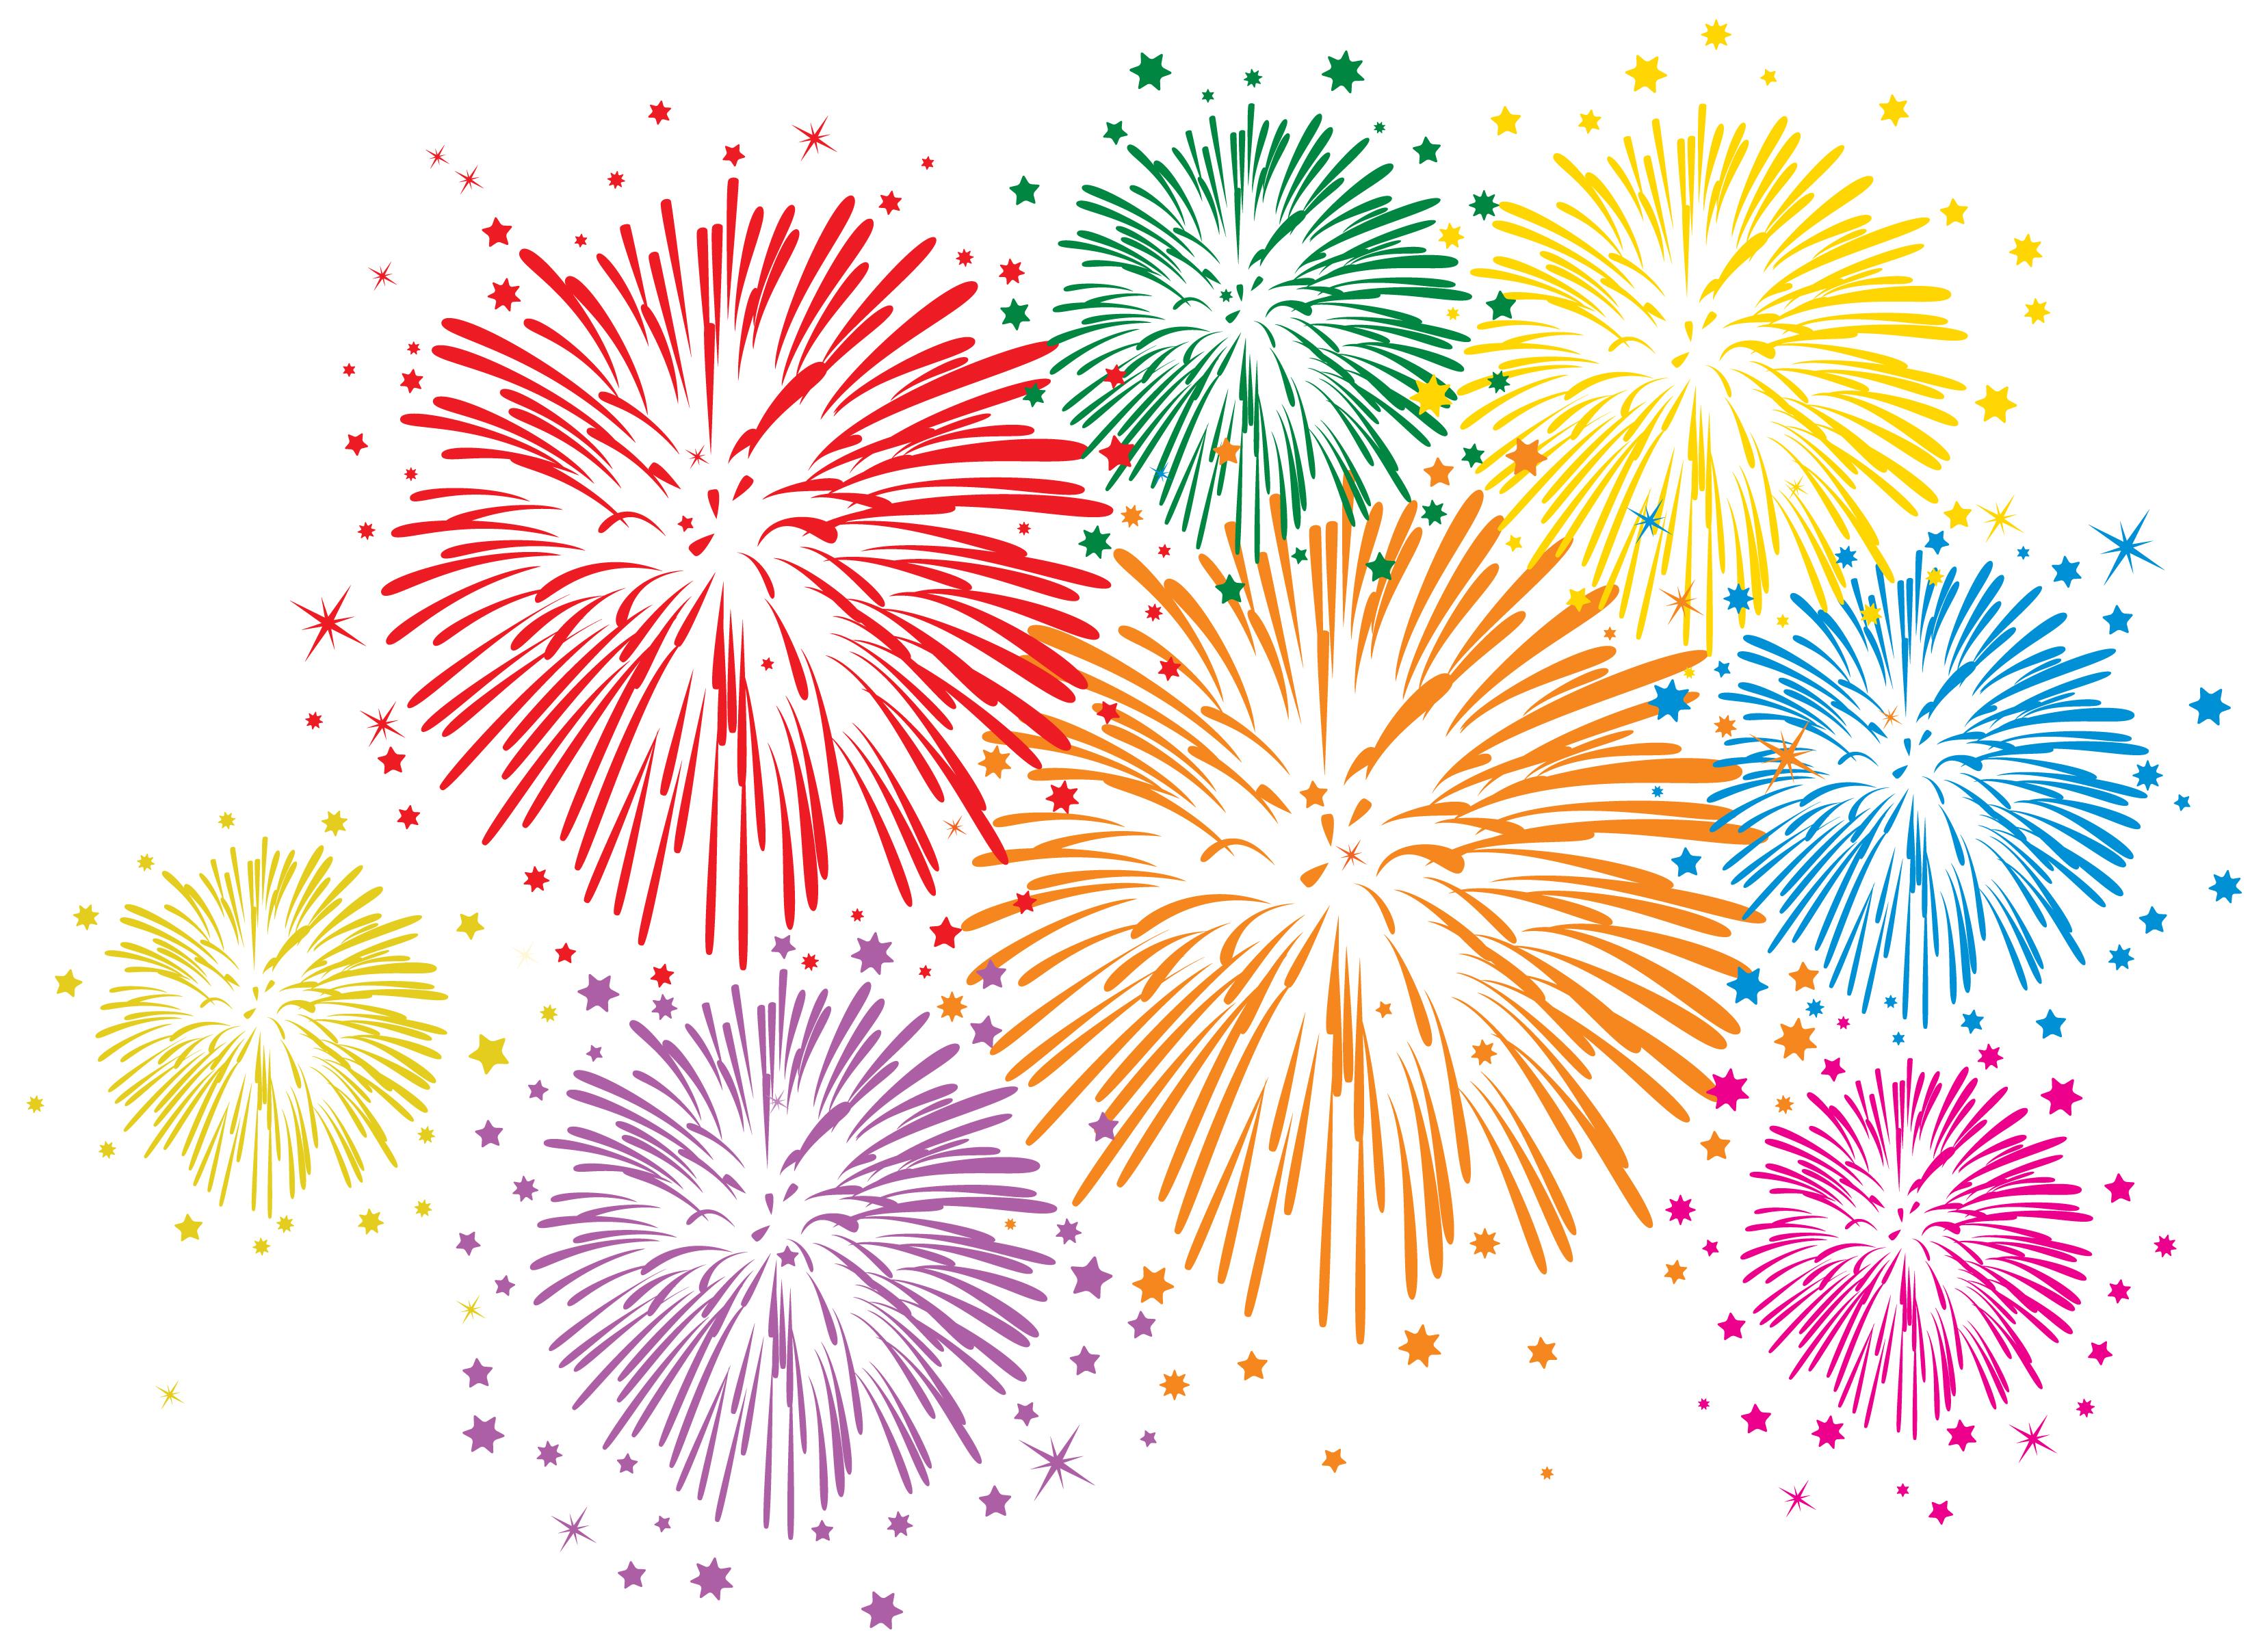 Firework images clipart png transparent stock 64+ Fireworks Clipart | ClipartLook png transparent stock